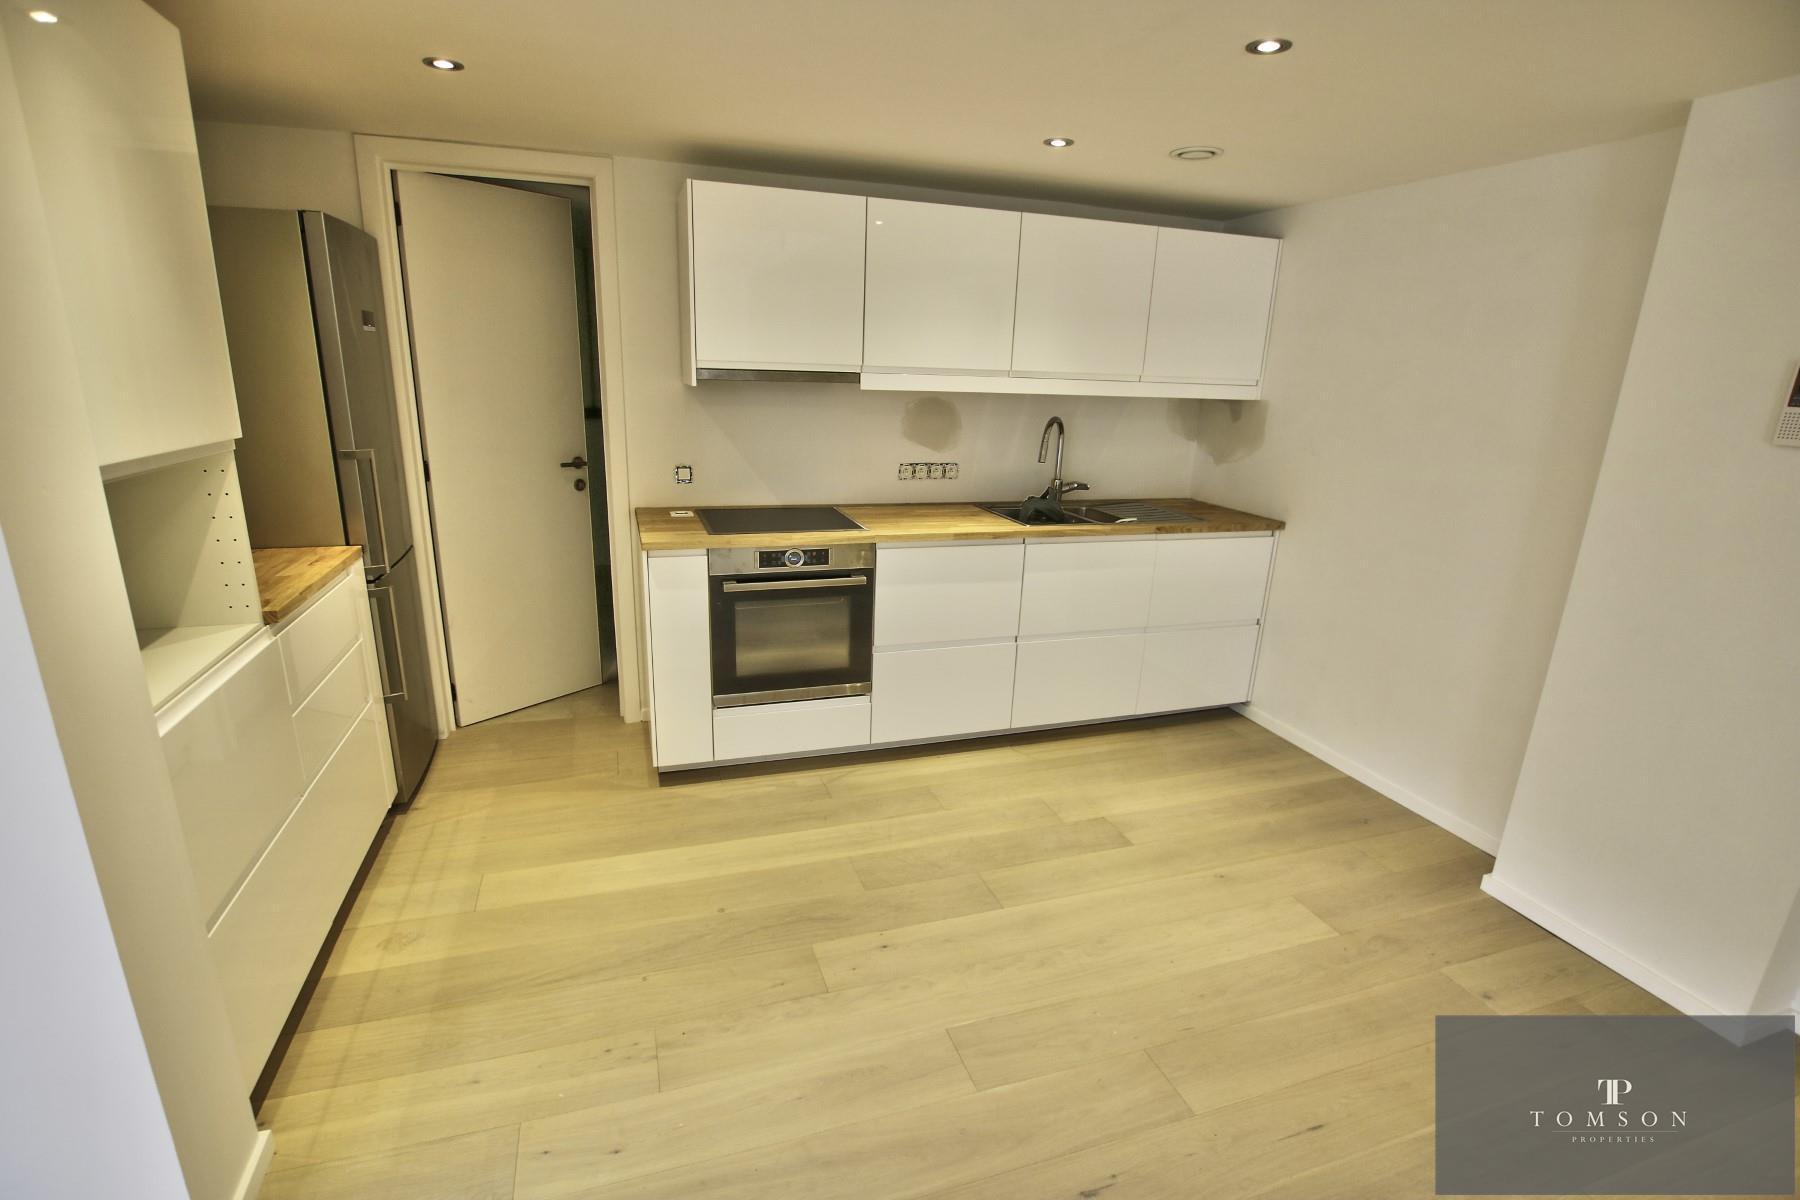 Flat - Etterbeek - #4431086-1